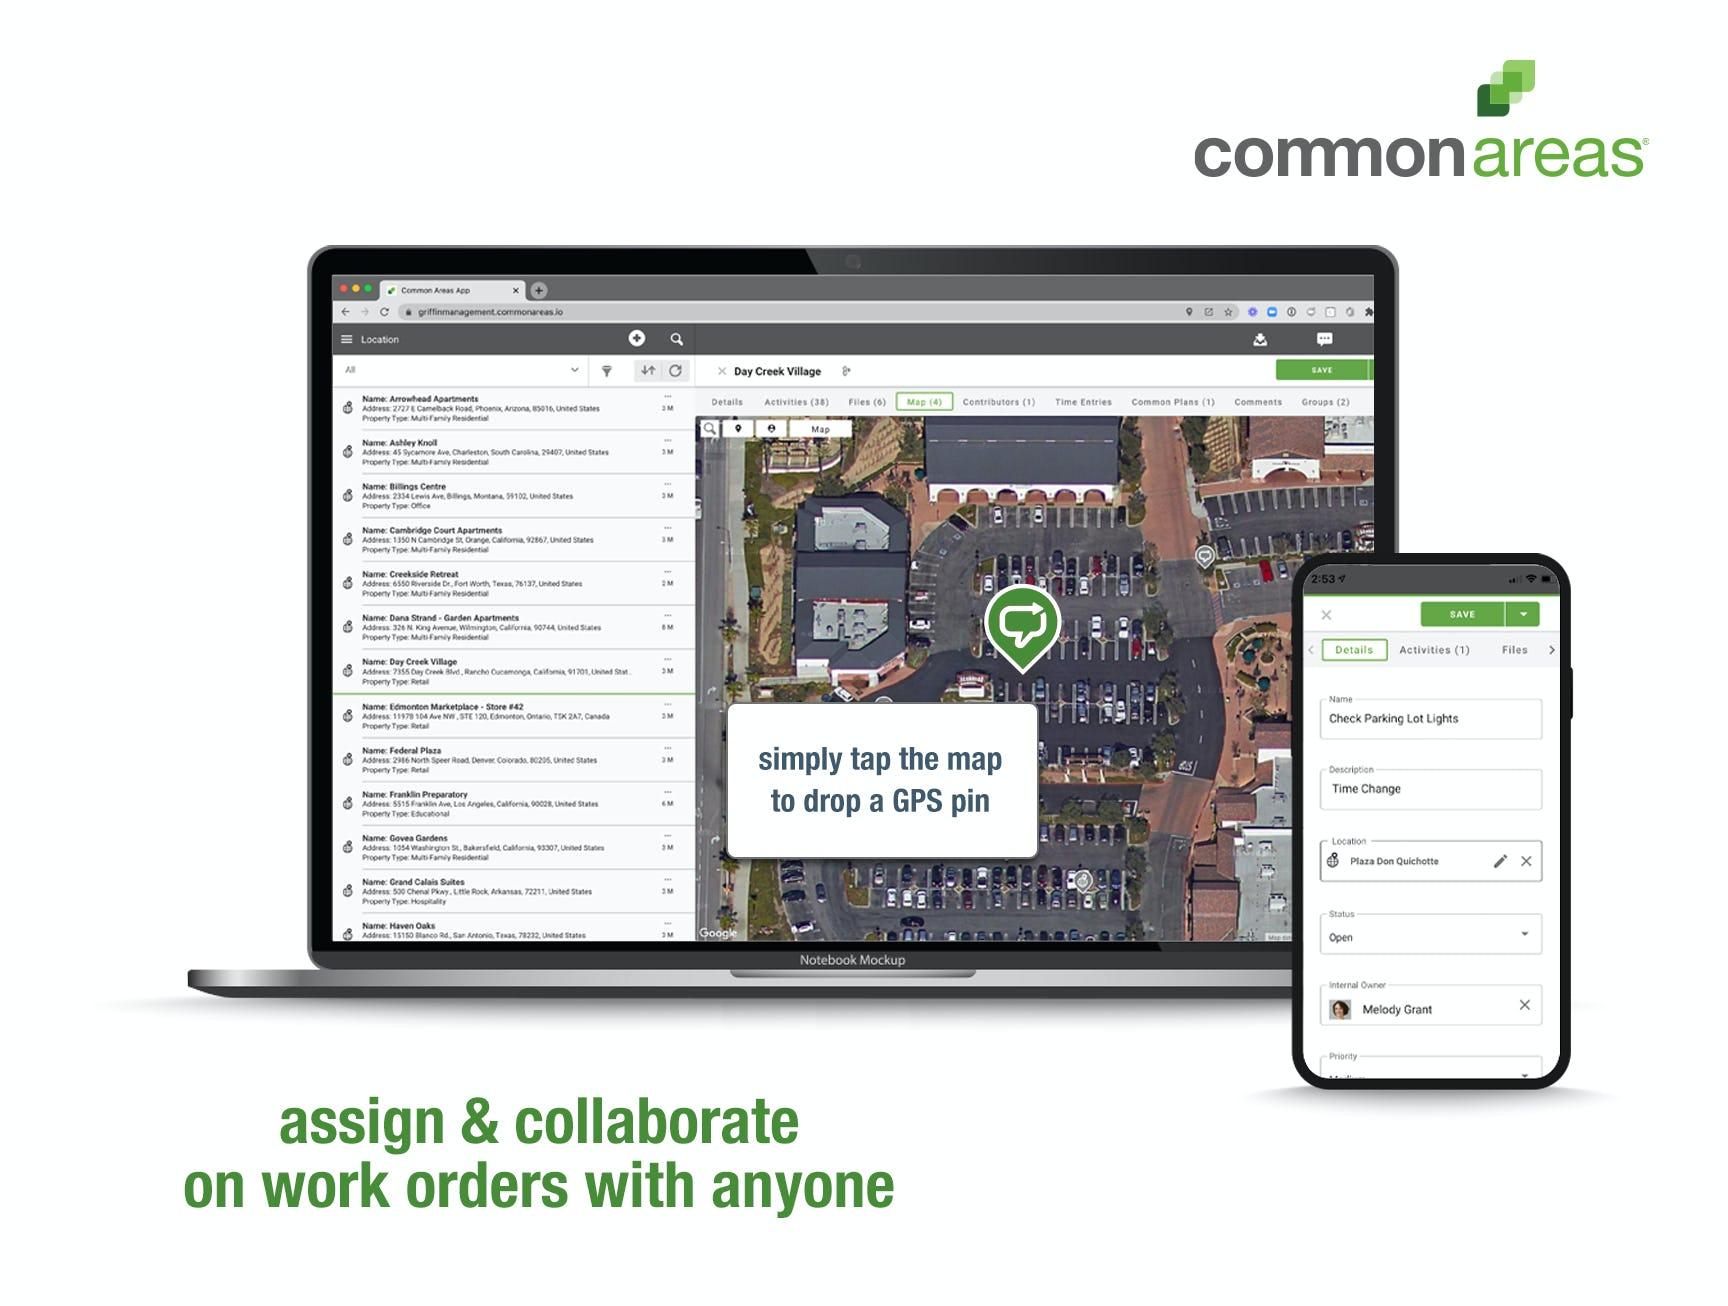 Common Areas Logiciel - 4